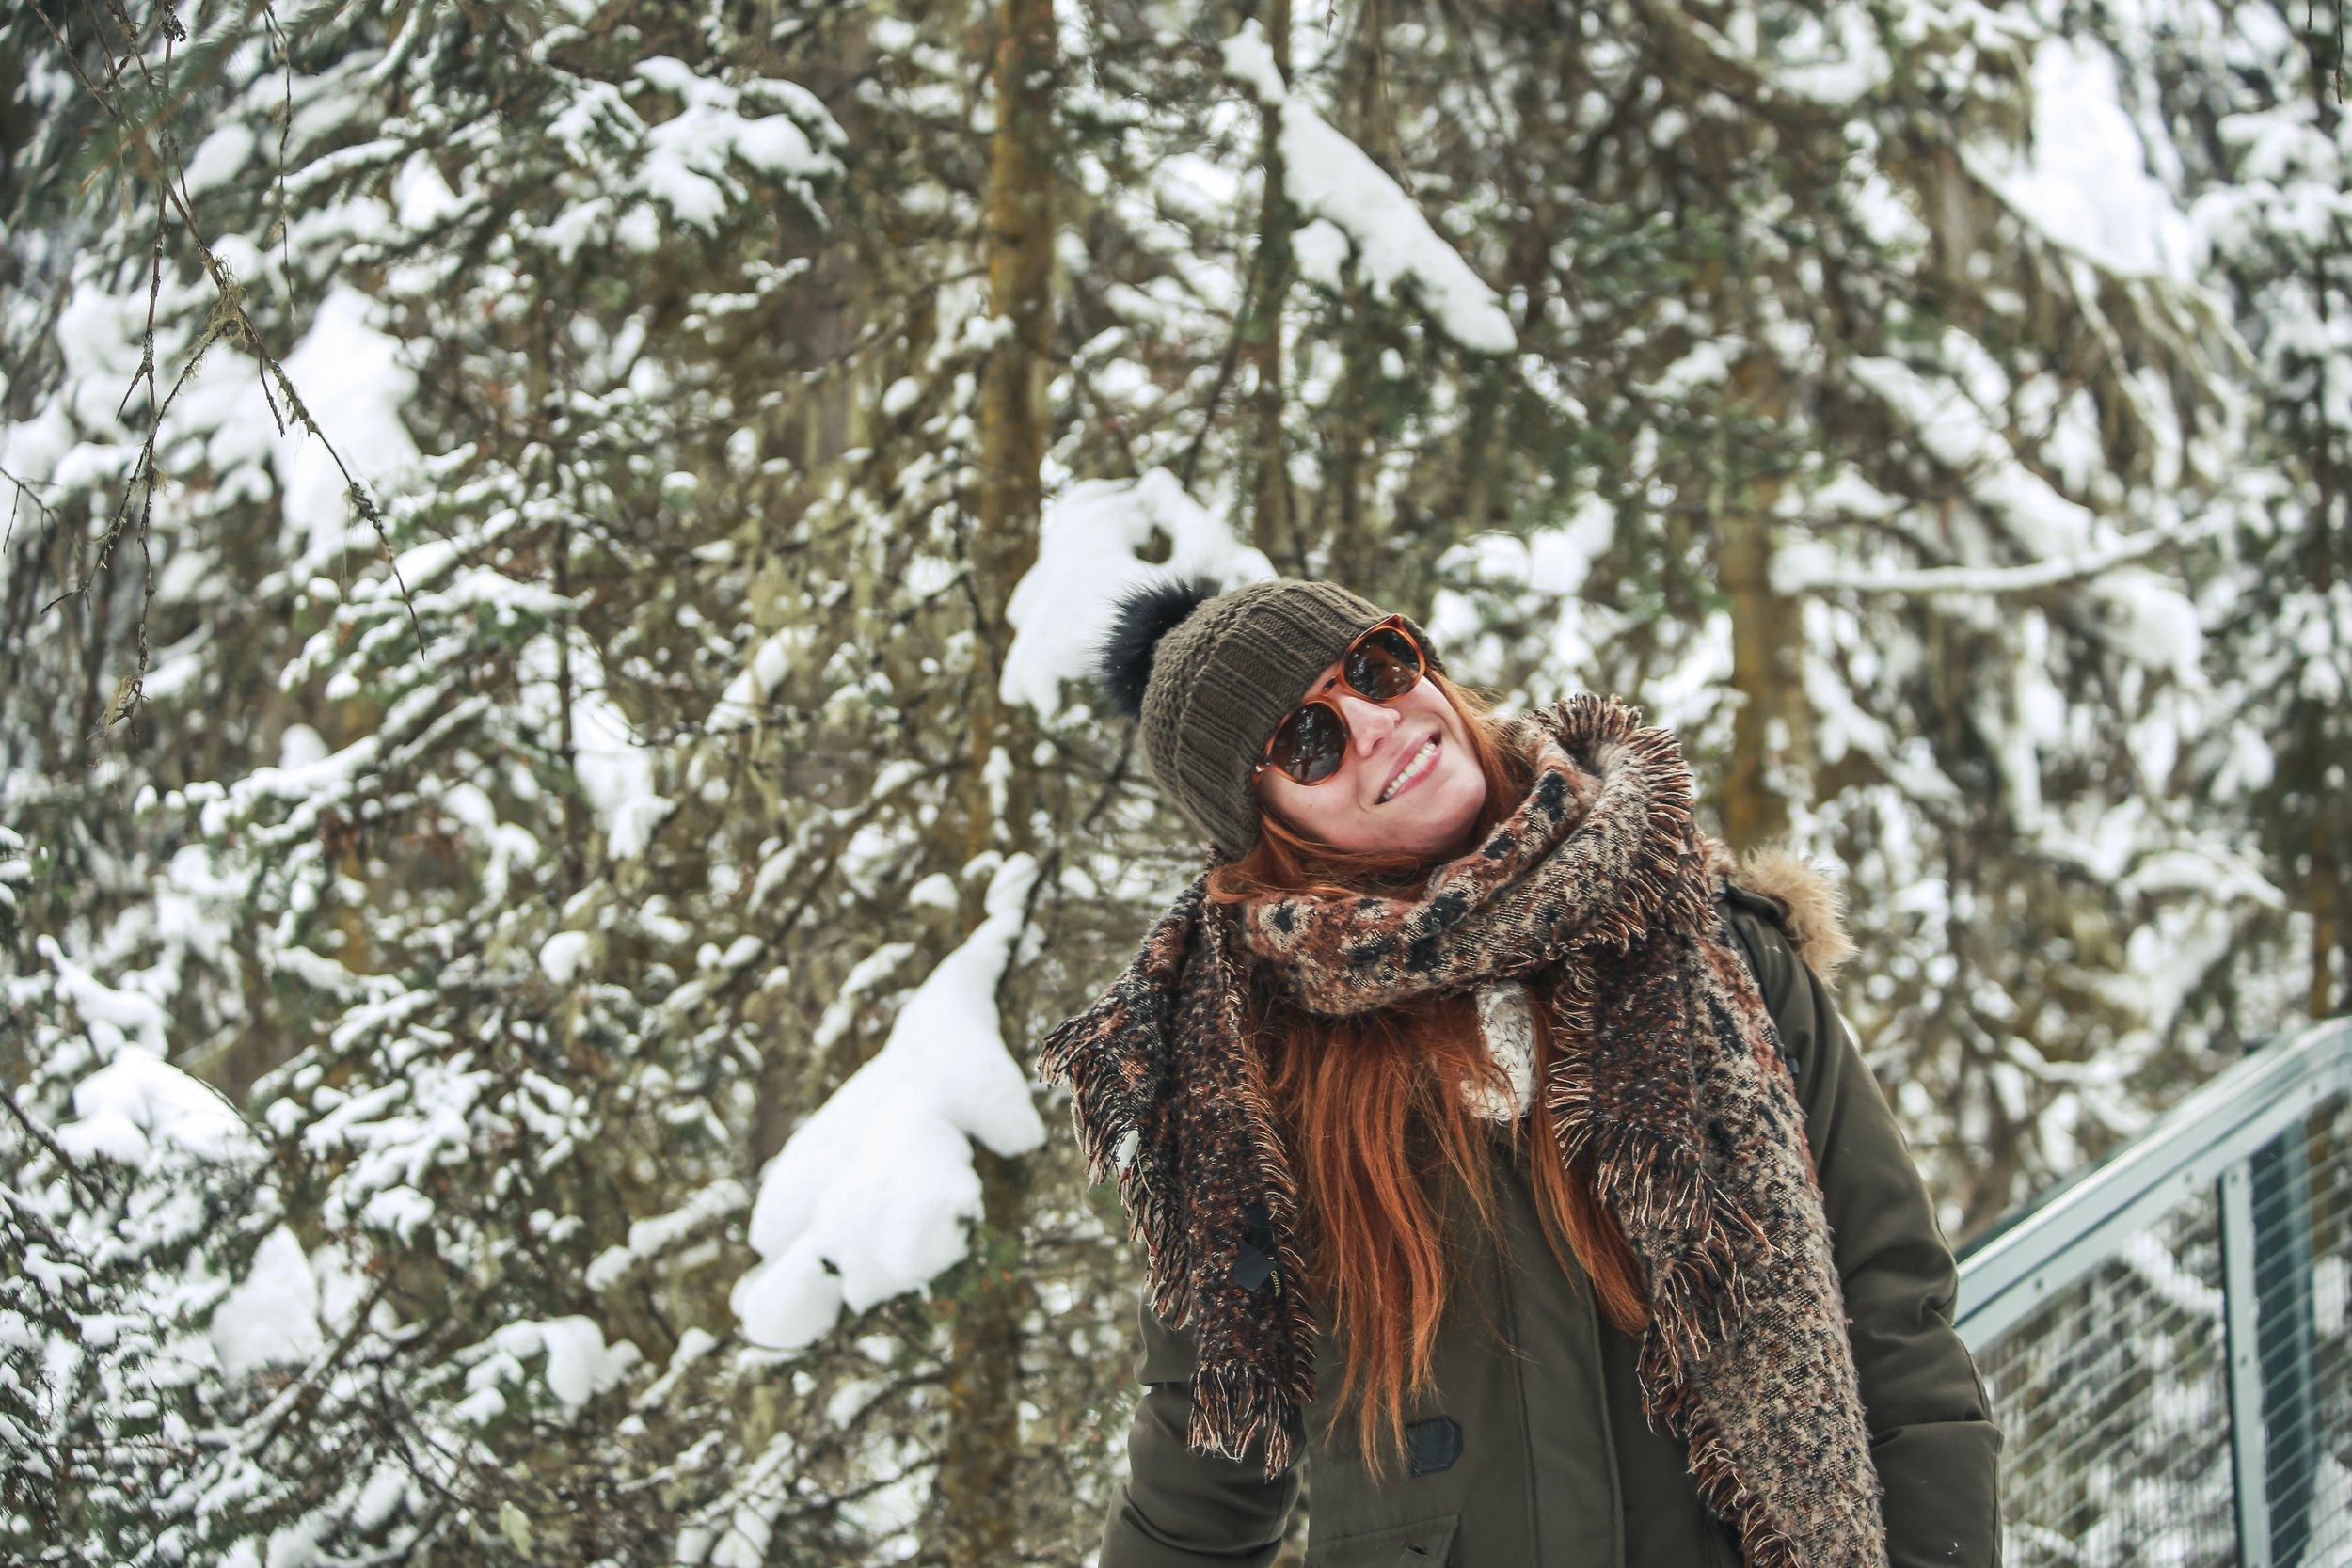 redhead-round-the-world-blog-blogger-canada-snow-1.JPG